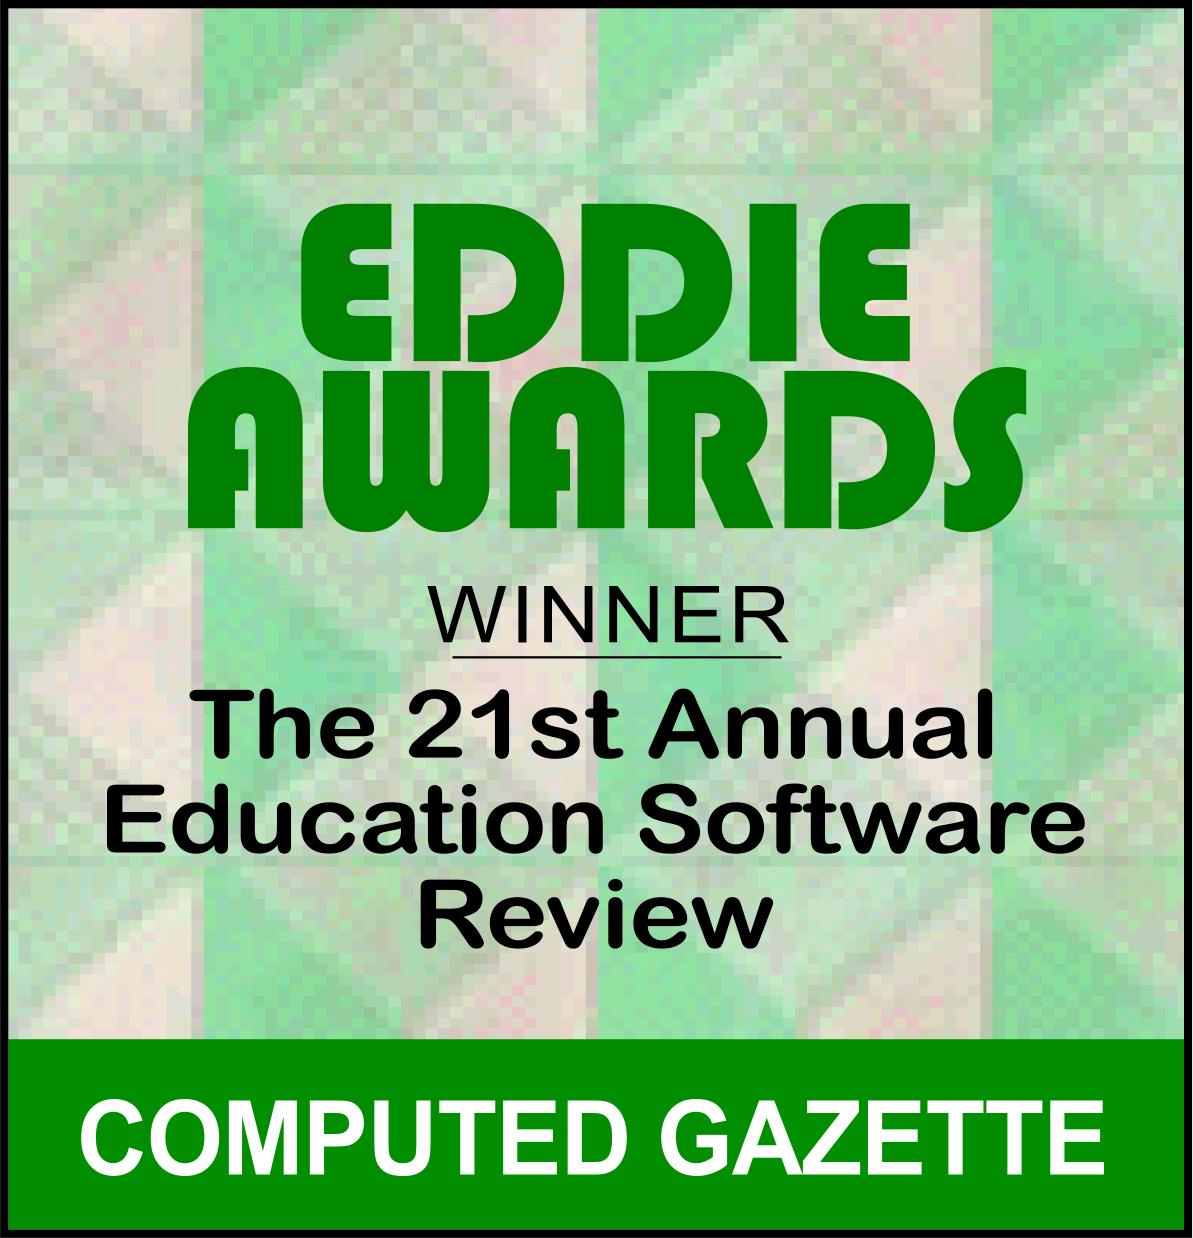 Eddie_Awards_Logo_2016.jpg